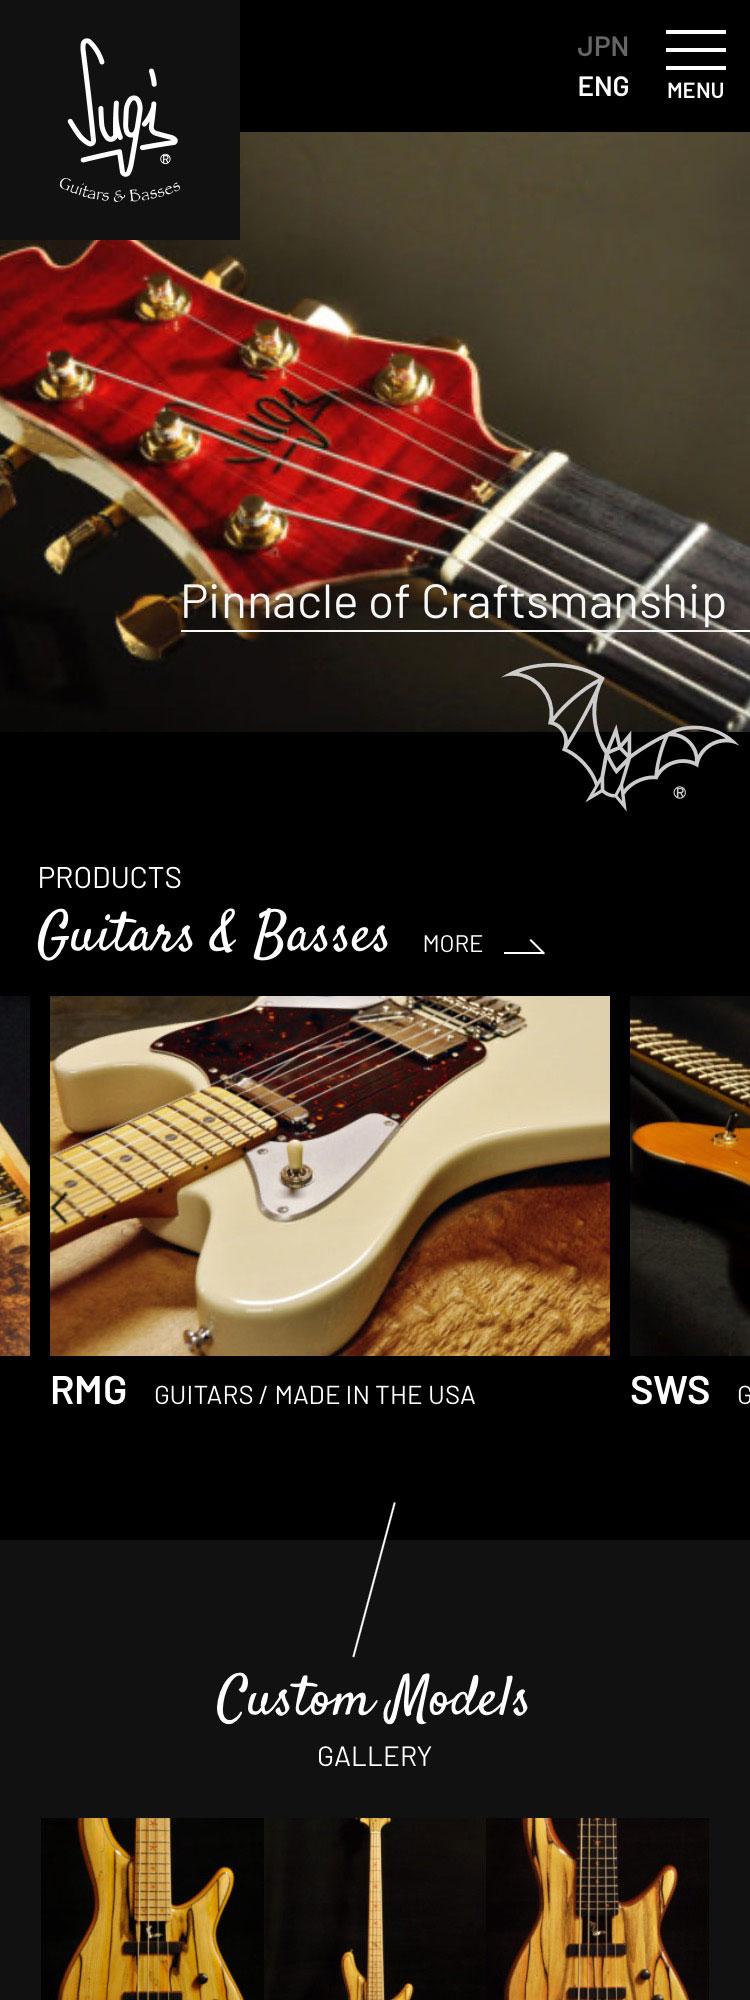 Sugi Guitars